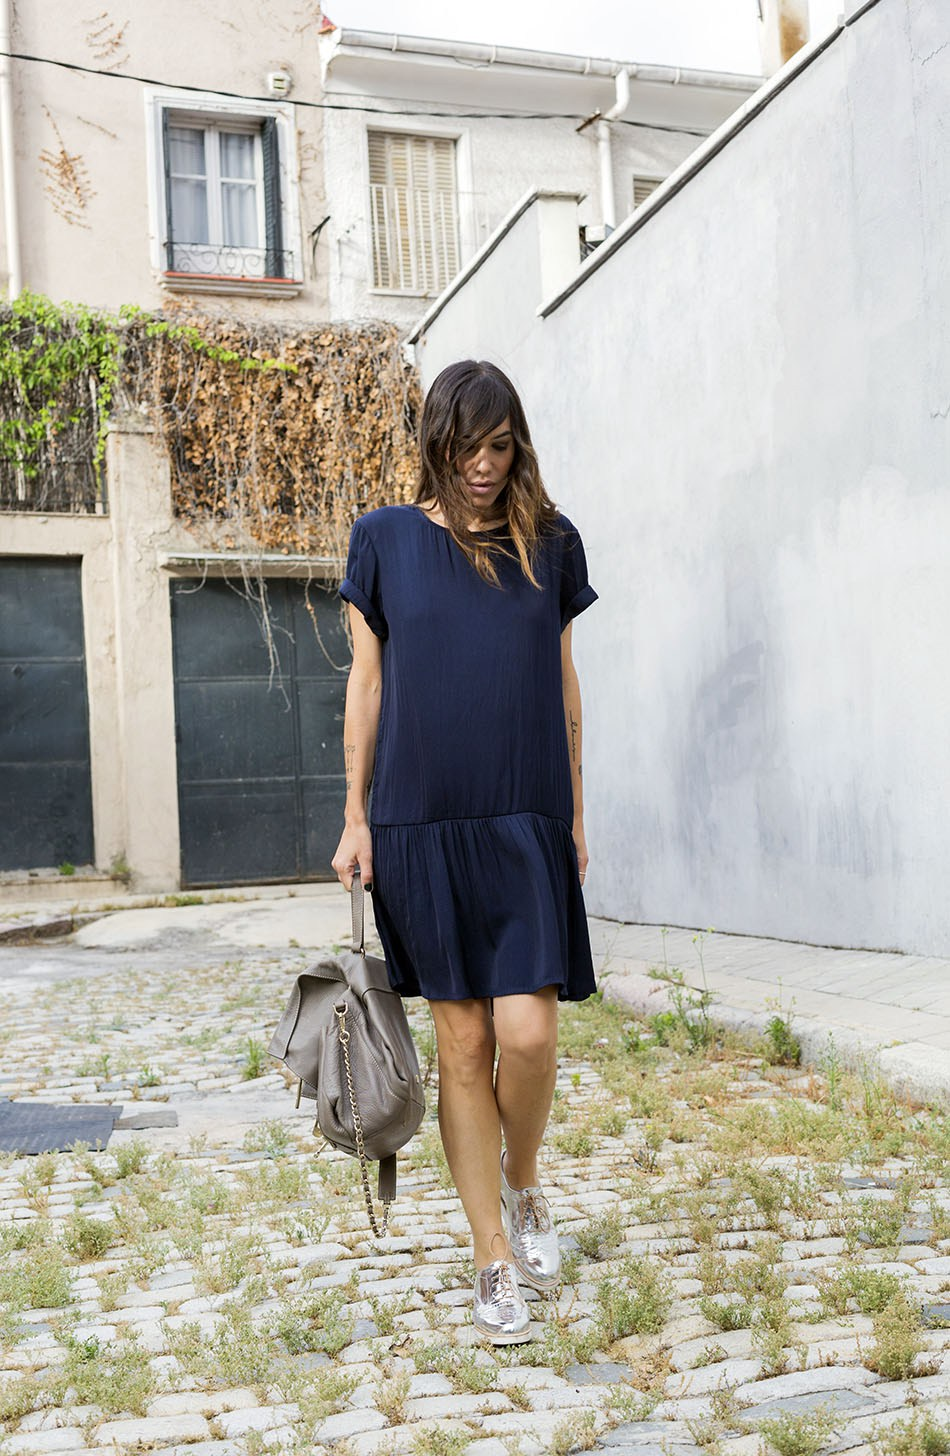 street style june 2016 outfits review bárbara crespo 10